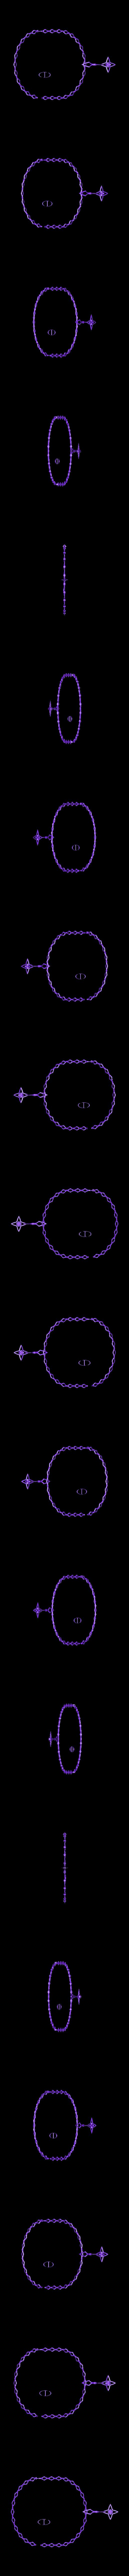 collier shuriken.stl Download free STL file Star shuriken necklace and ring • 3D printing template, gialerital